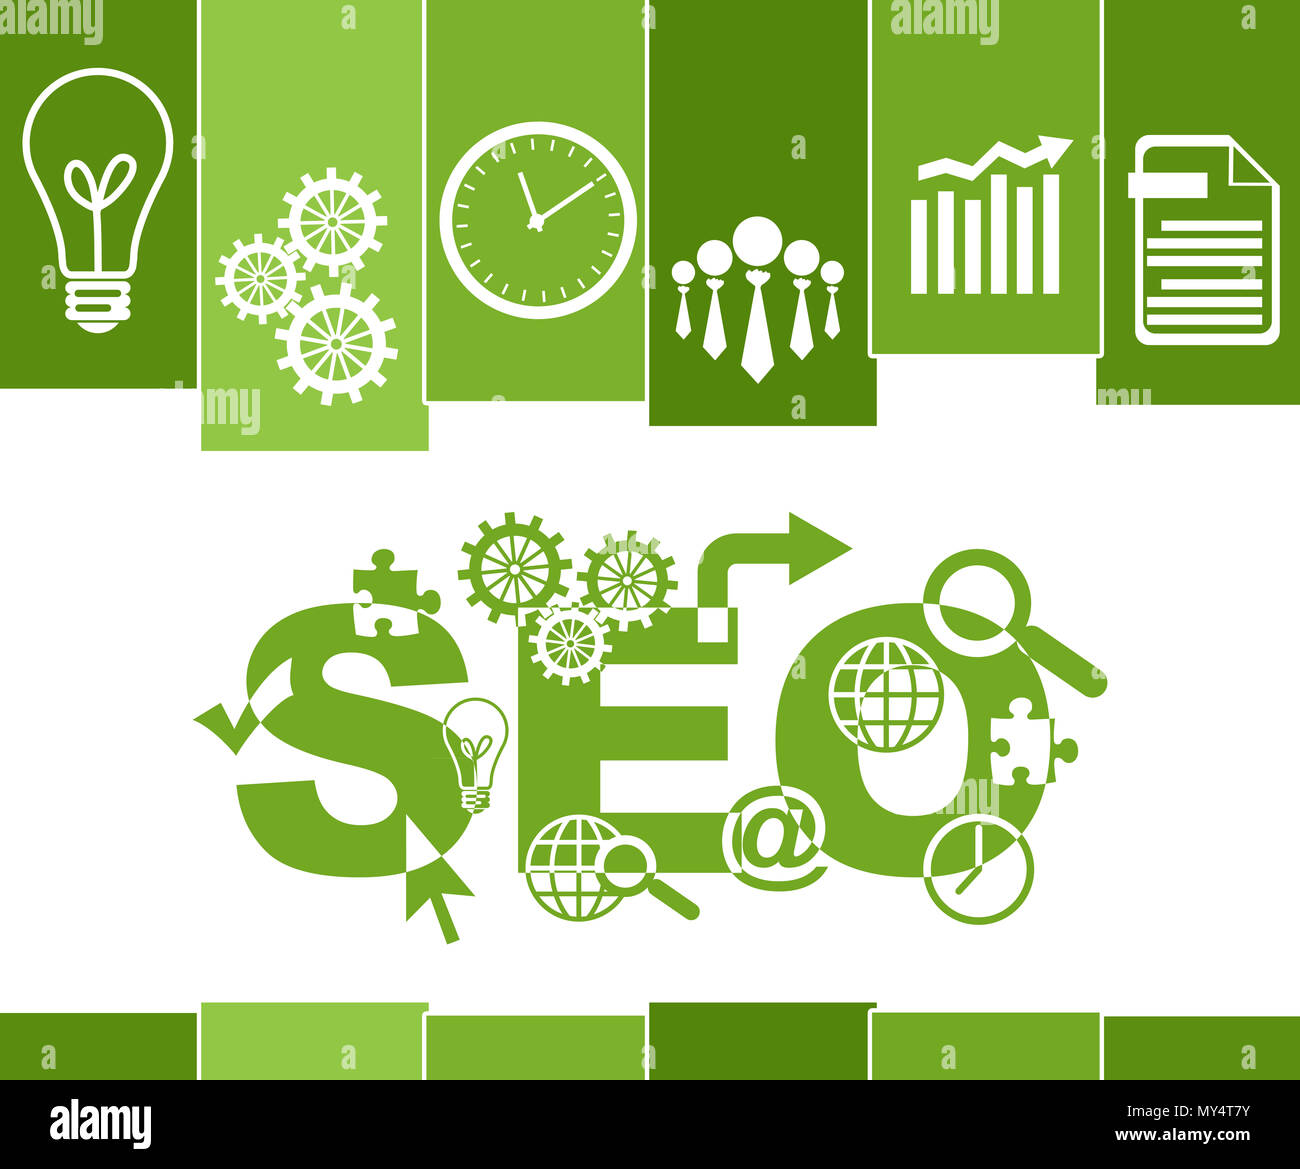 Seo Search Engine Optimization Green Stripes Symbols Stock Photo